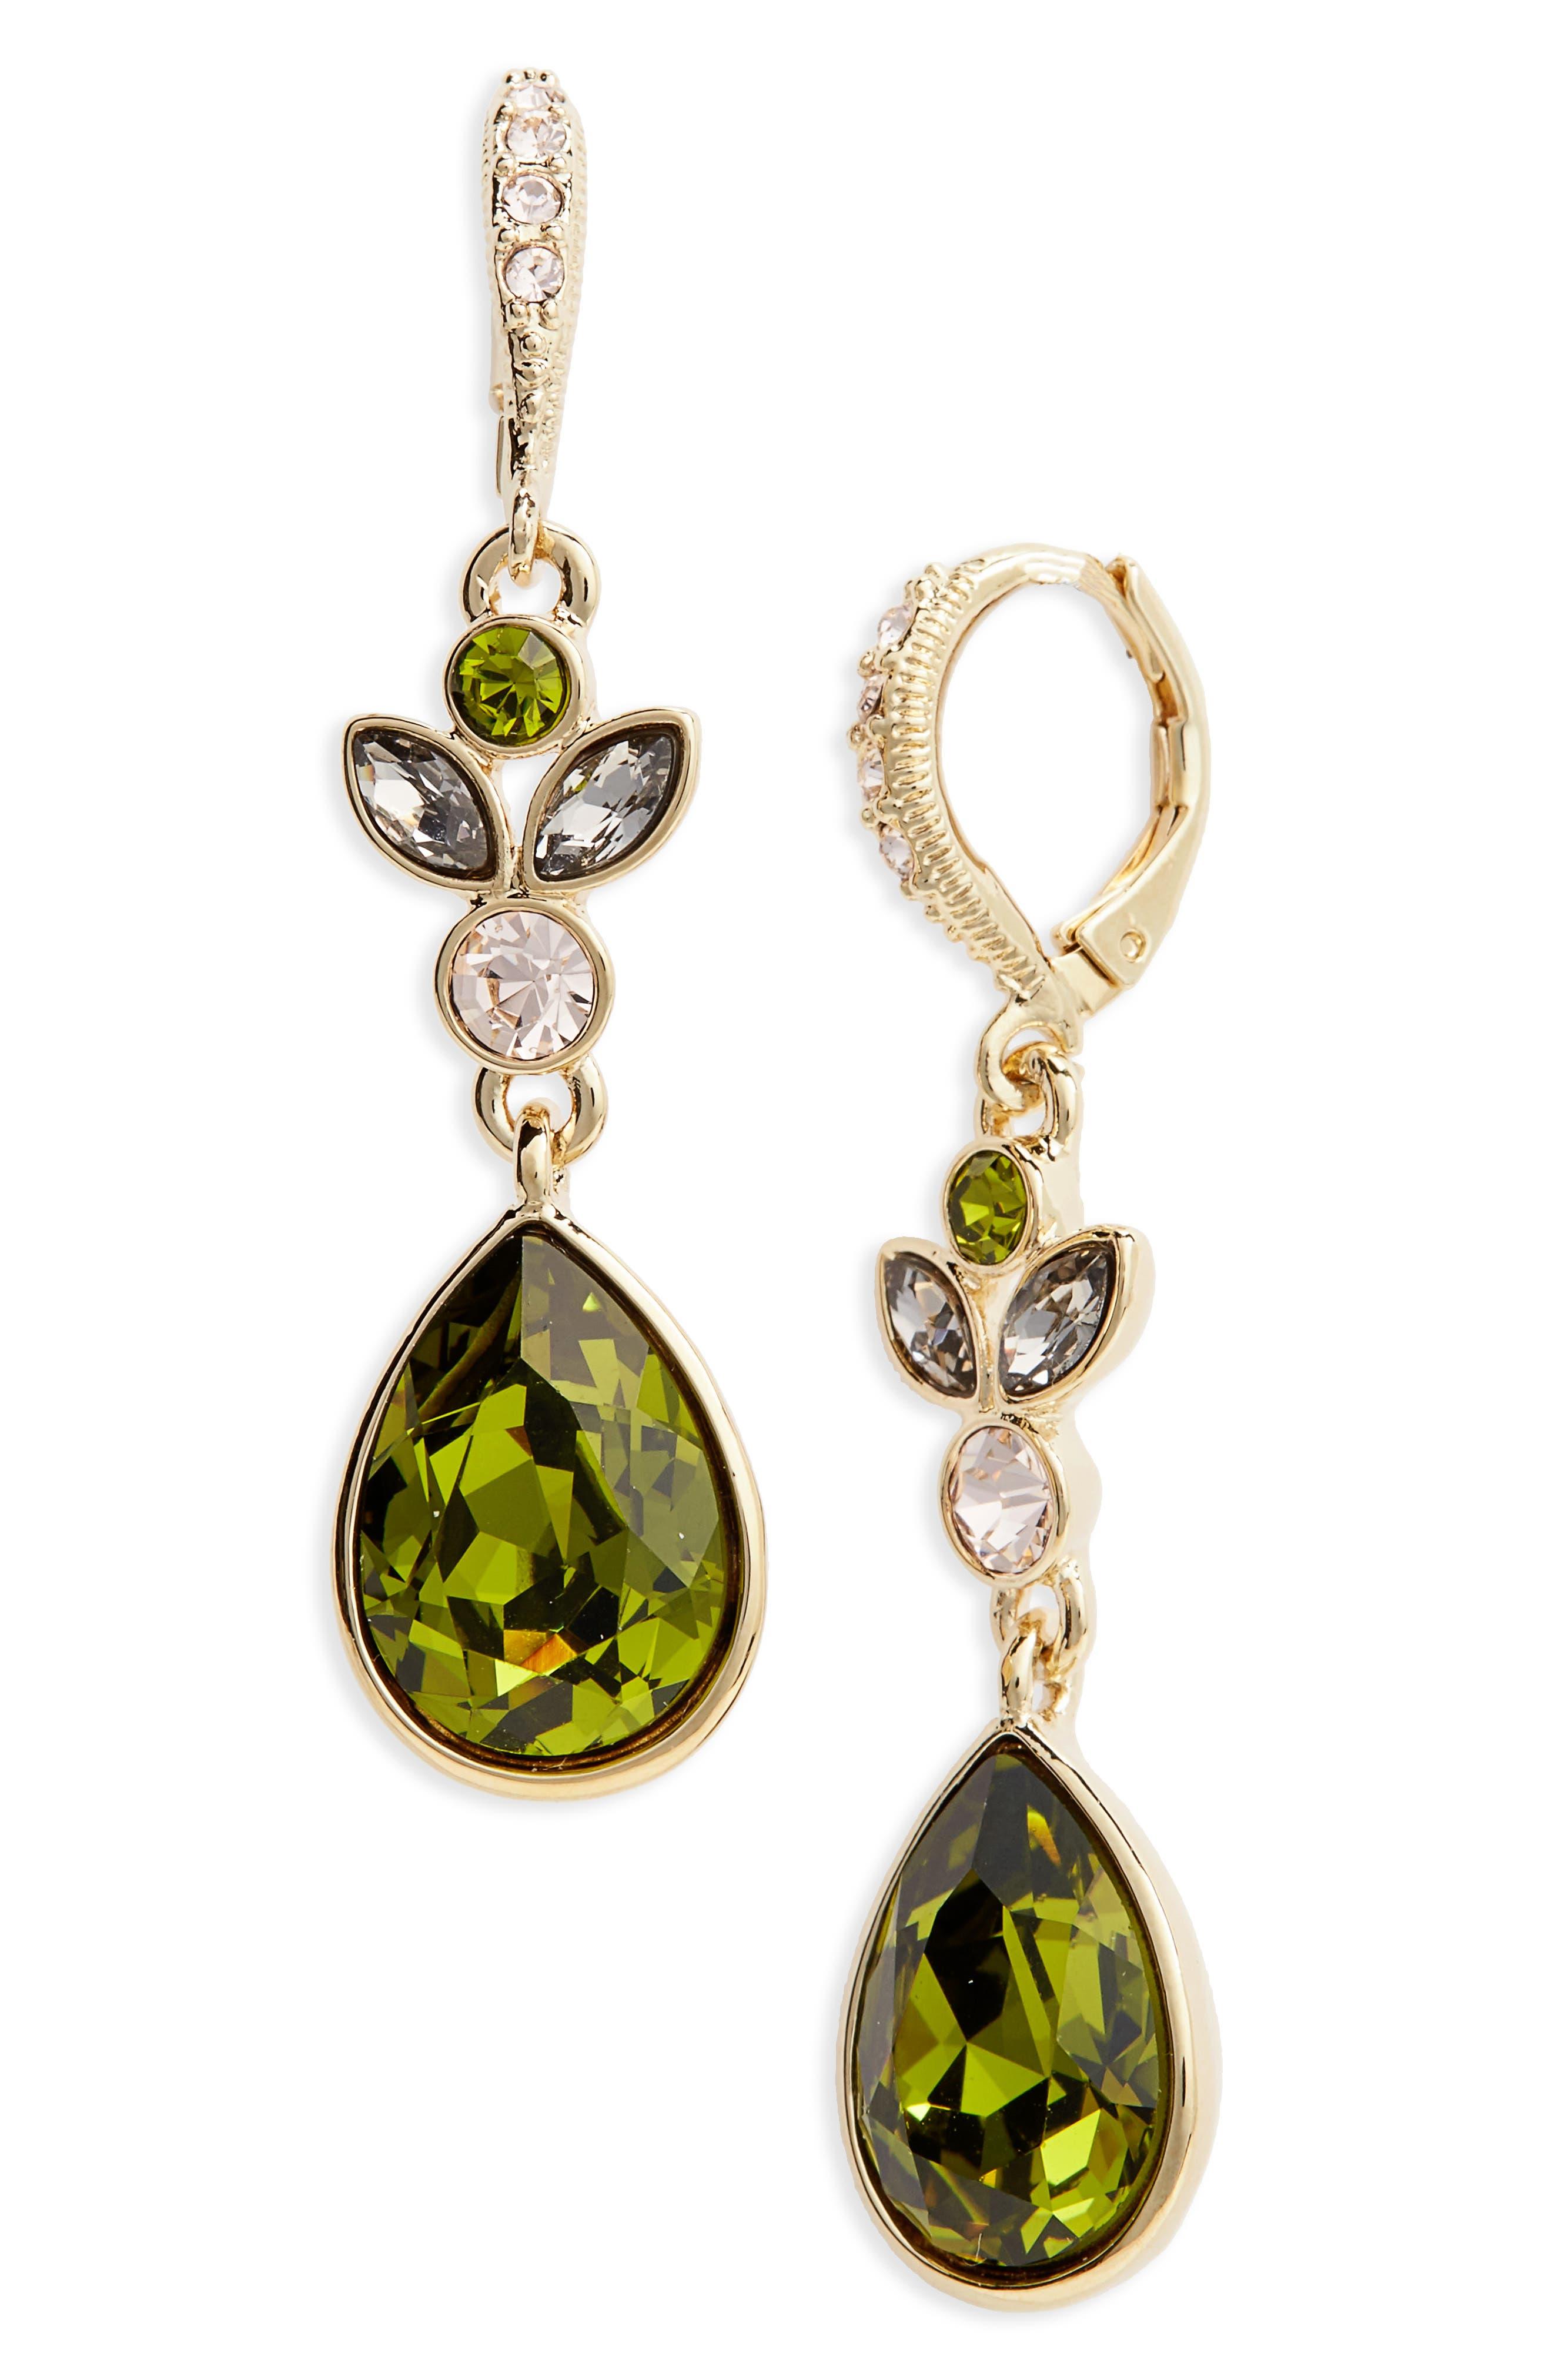 Givenchy Sydney Teardrop Earrings